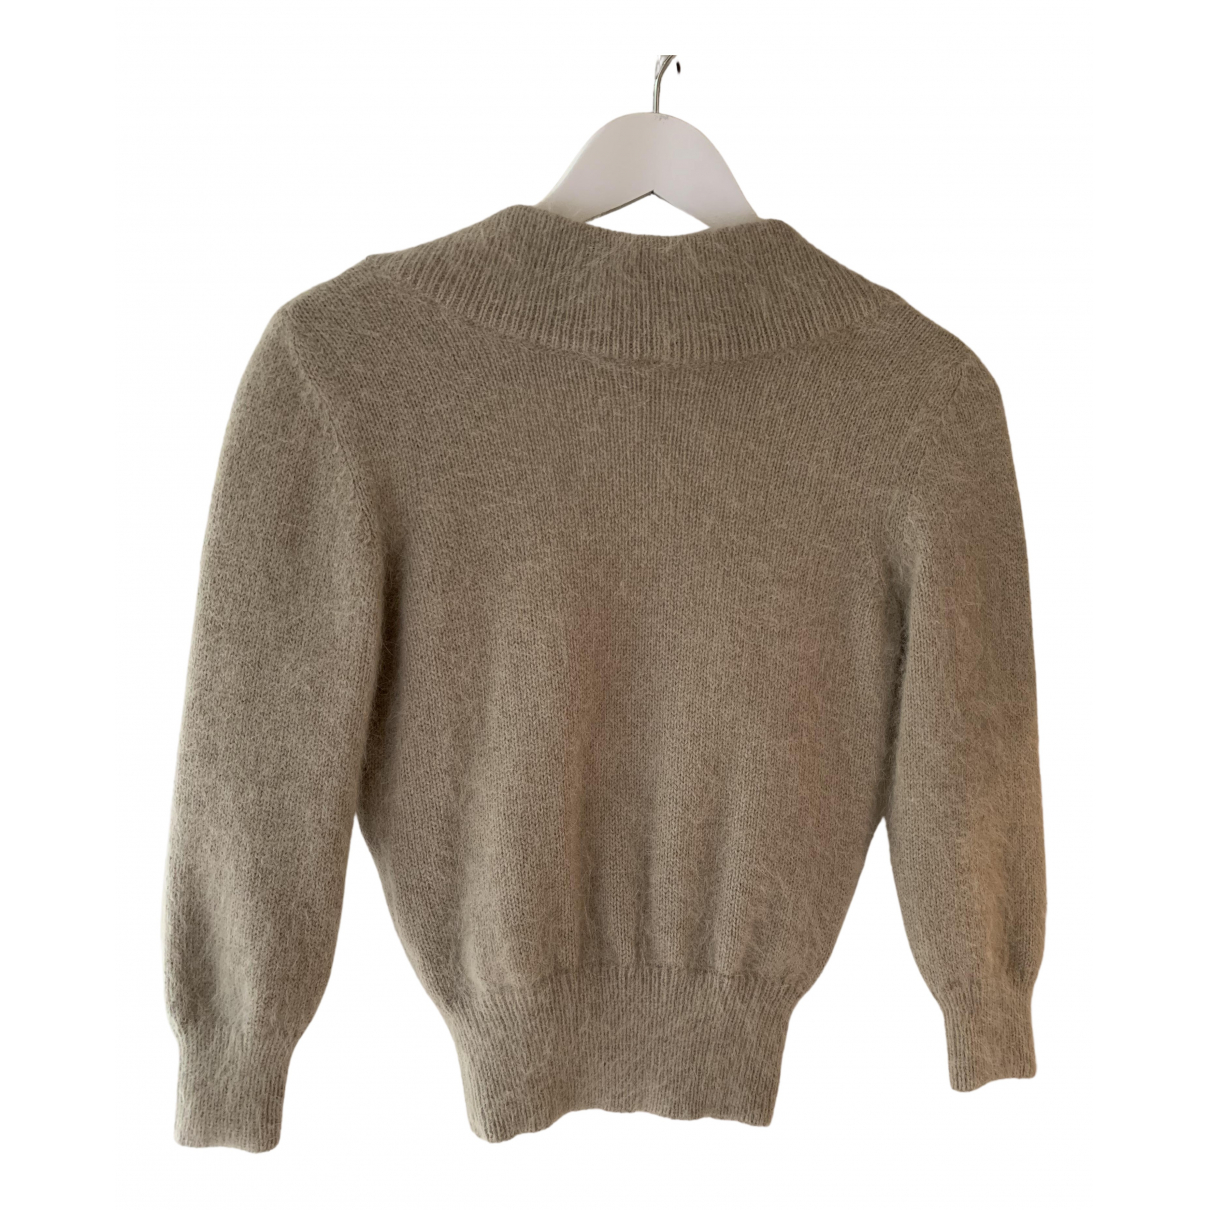 Alexander Mcqueen - Pull   pour femme en laine - beige